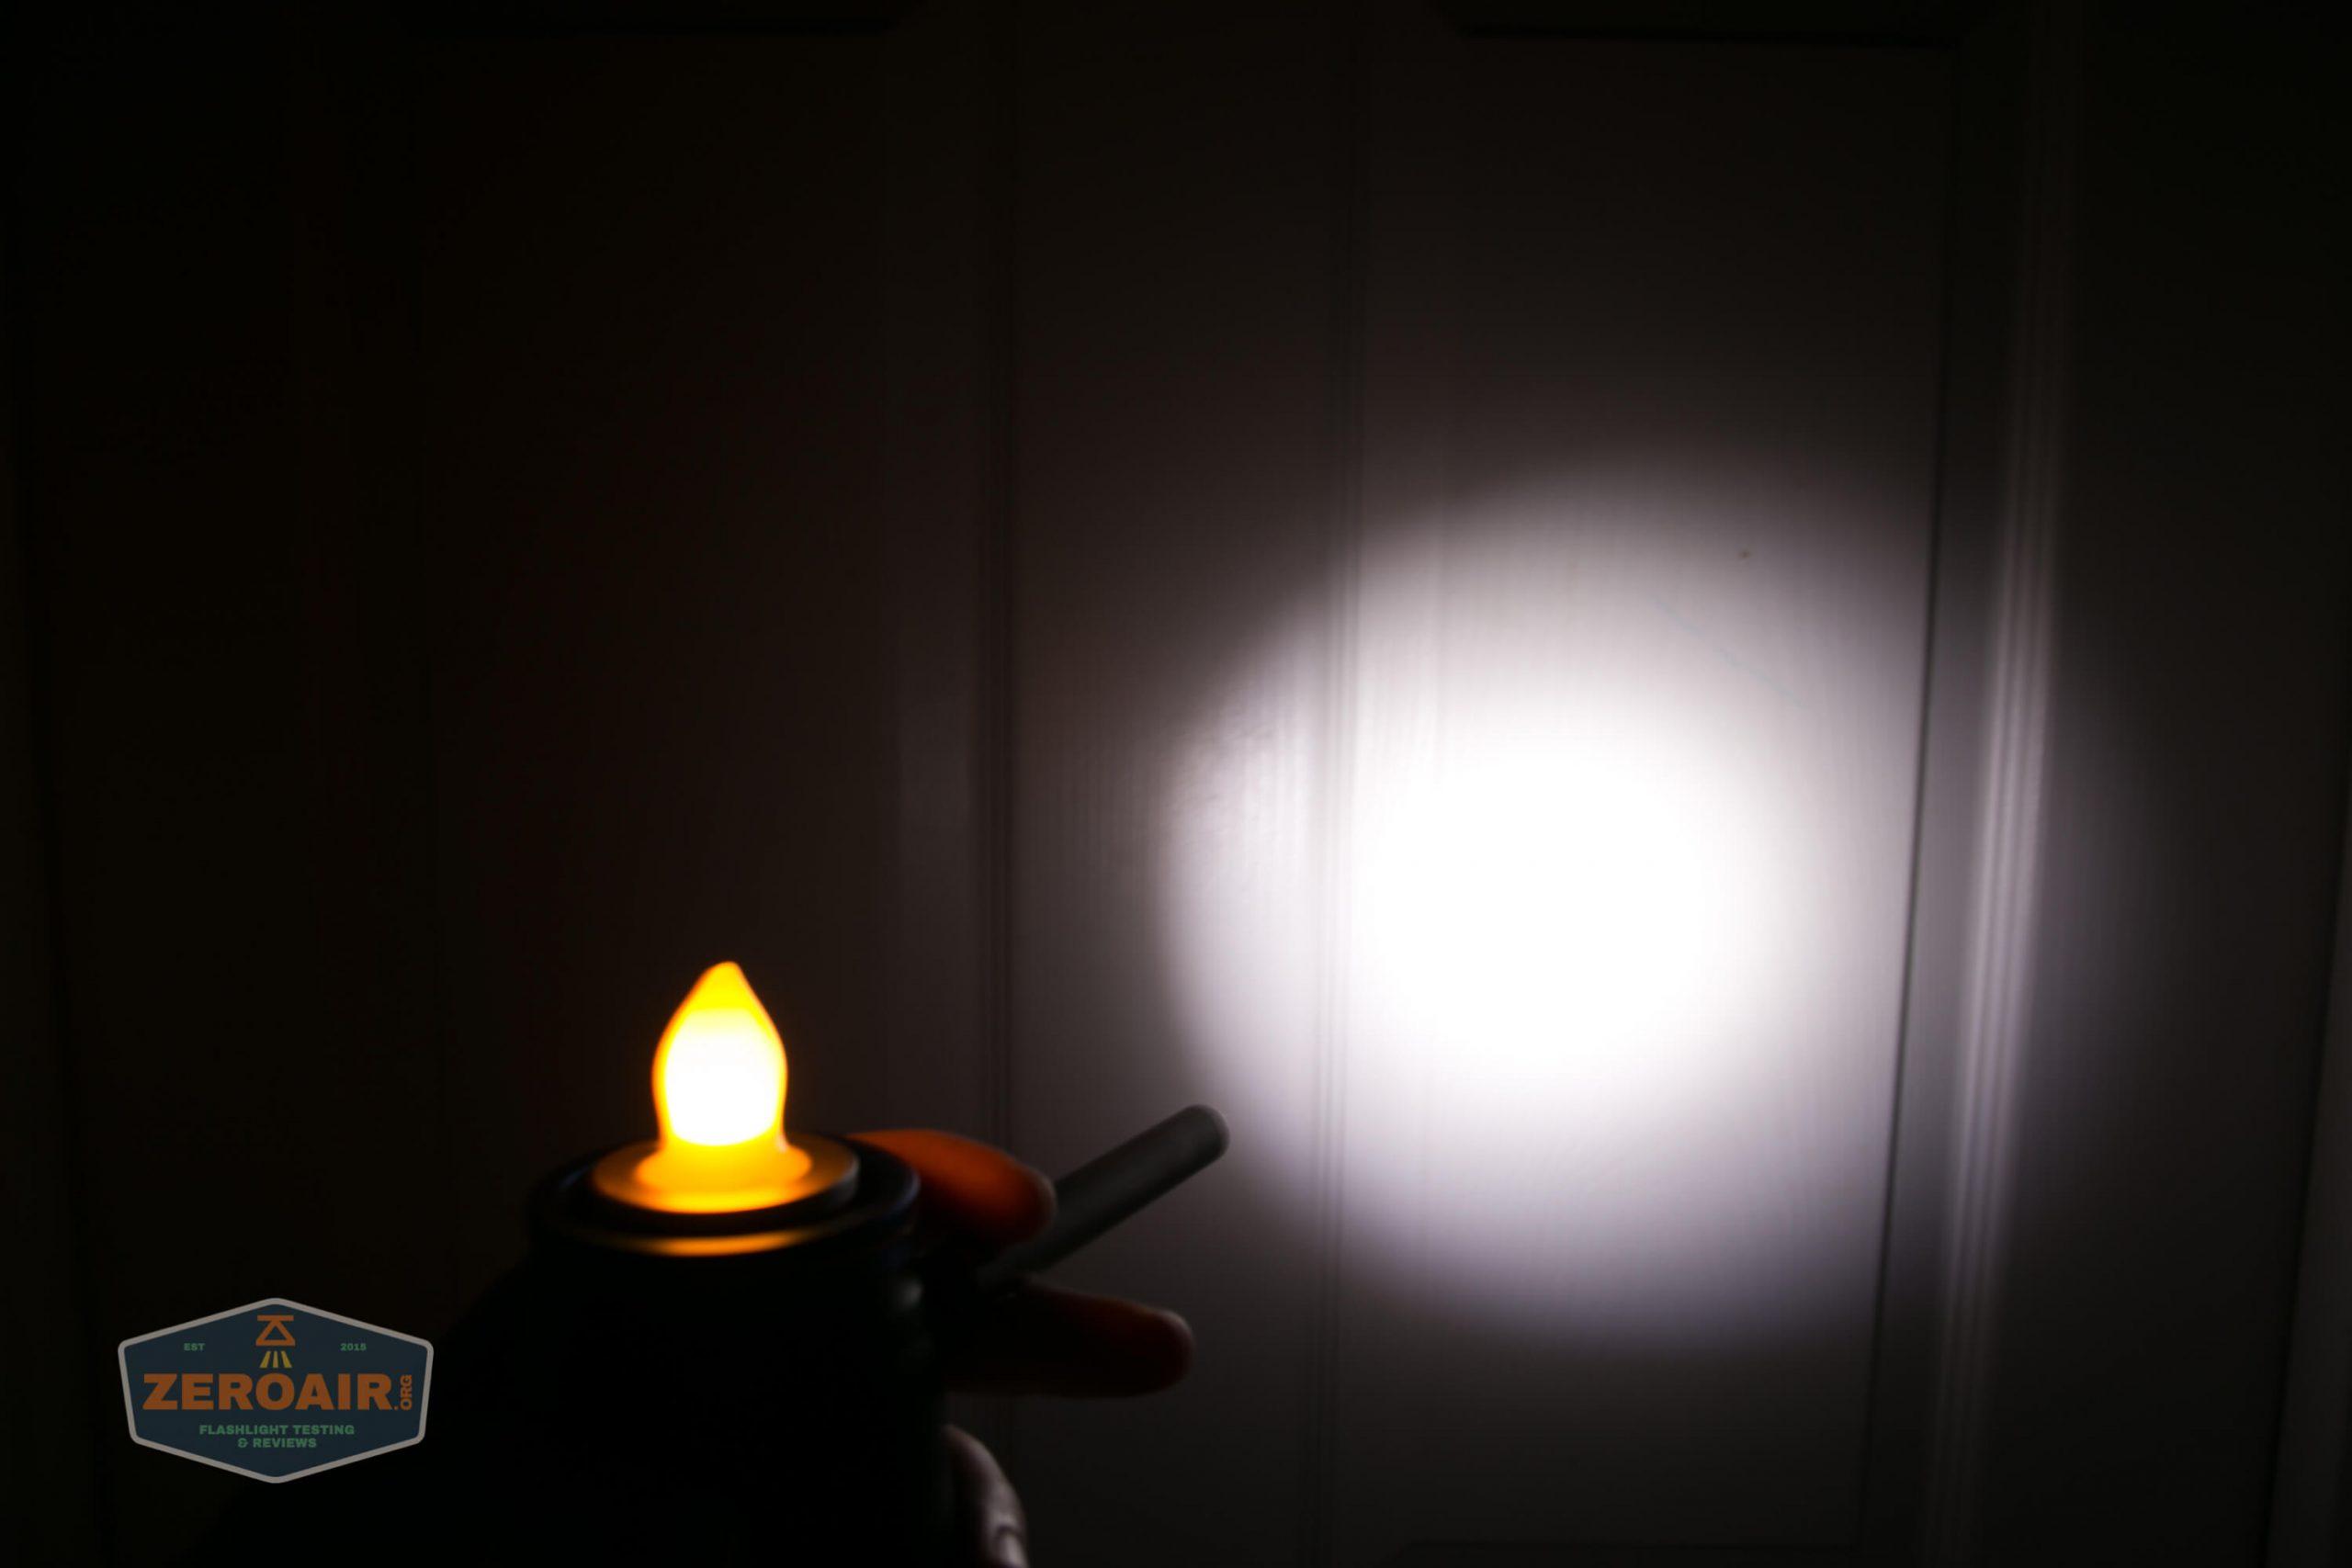 olight olantern lantern beamshots door flame lamp